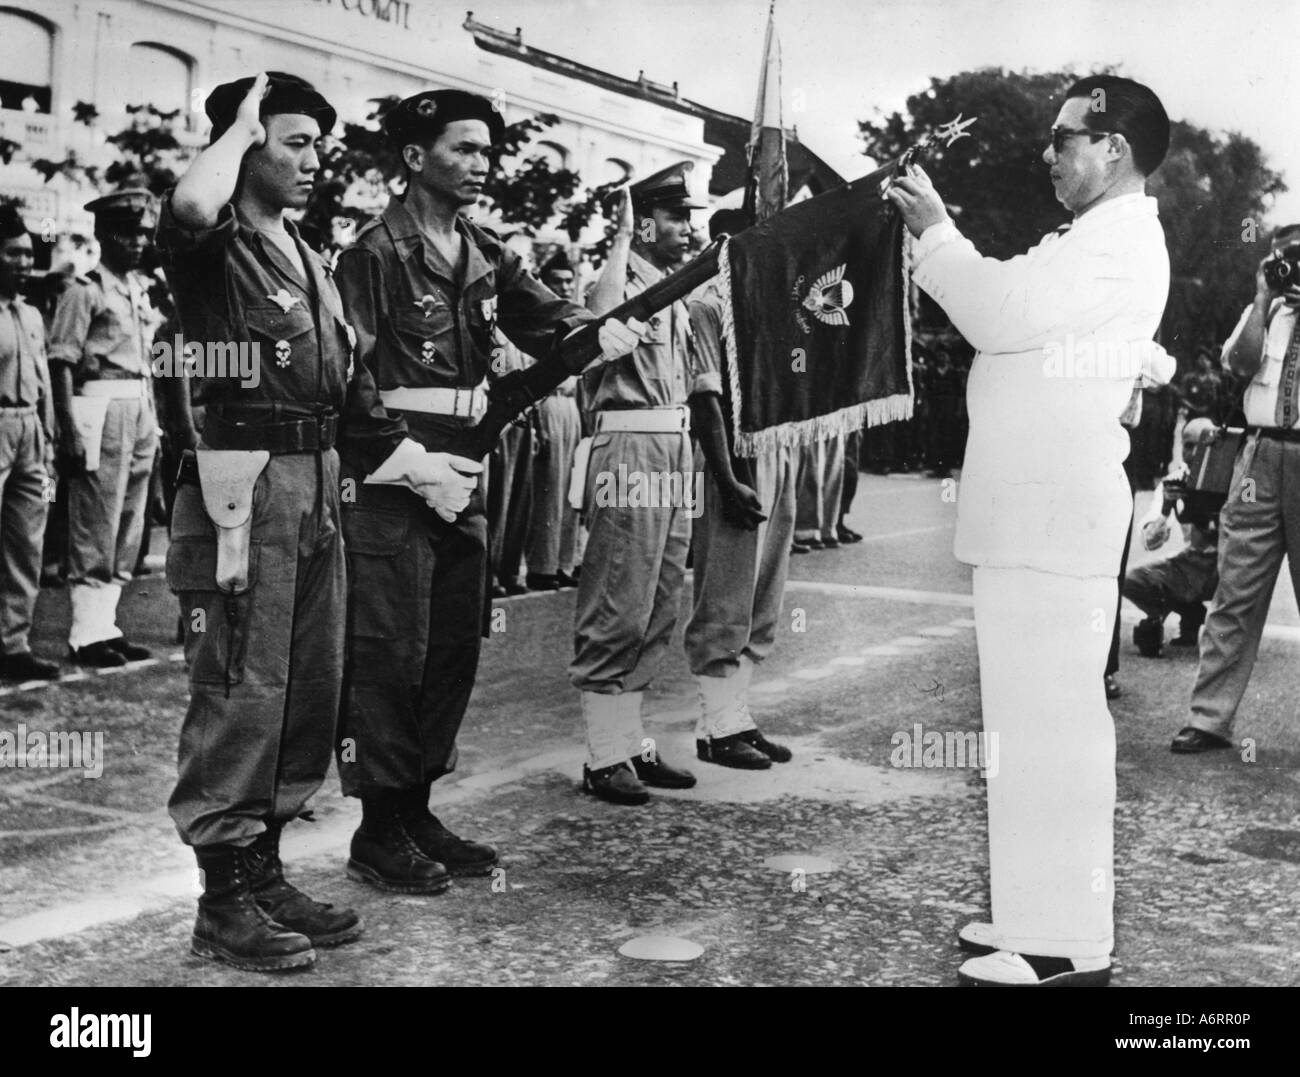 https://i0.wp.com/c8.alamy.com/comp/A6RR0P/bao-dai-22101913-3171997-emperor-of-vietnam-1926-1945-head-of-state-A6RR0P.jpg